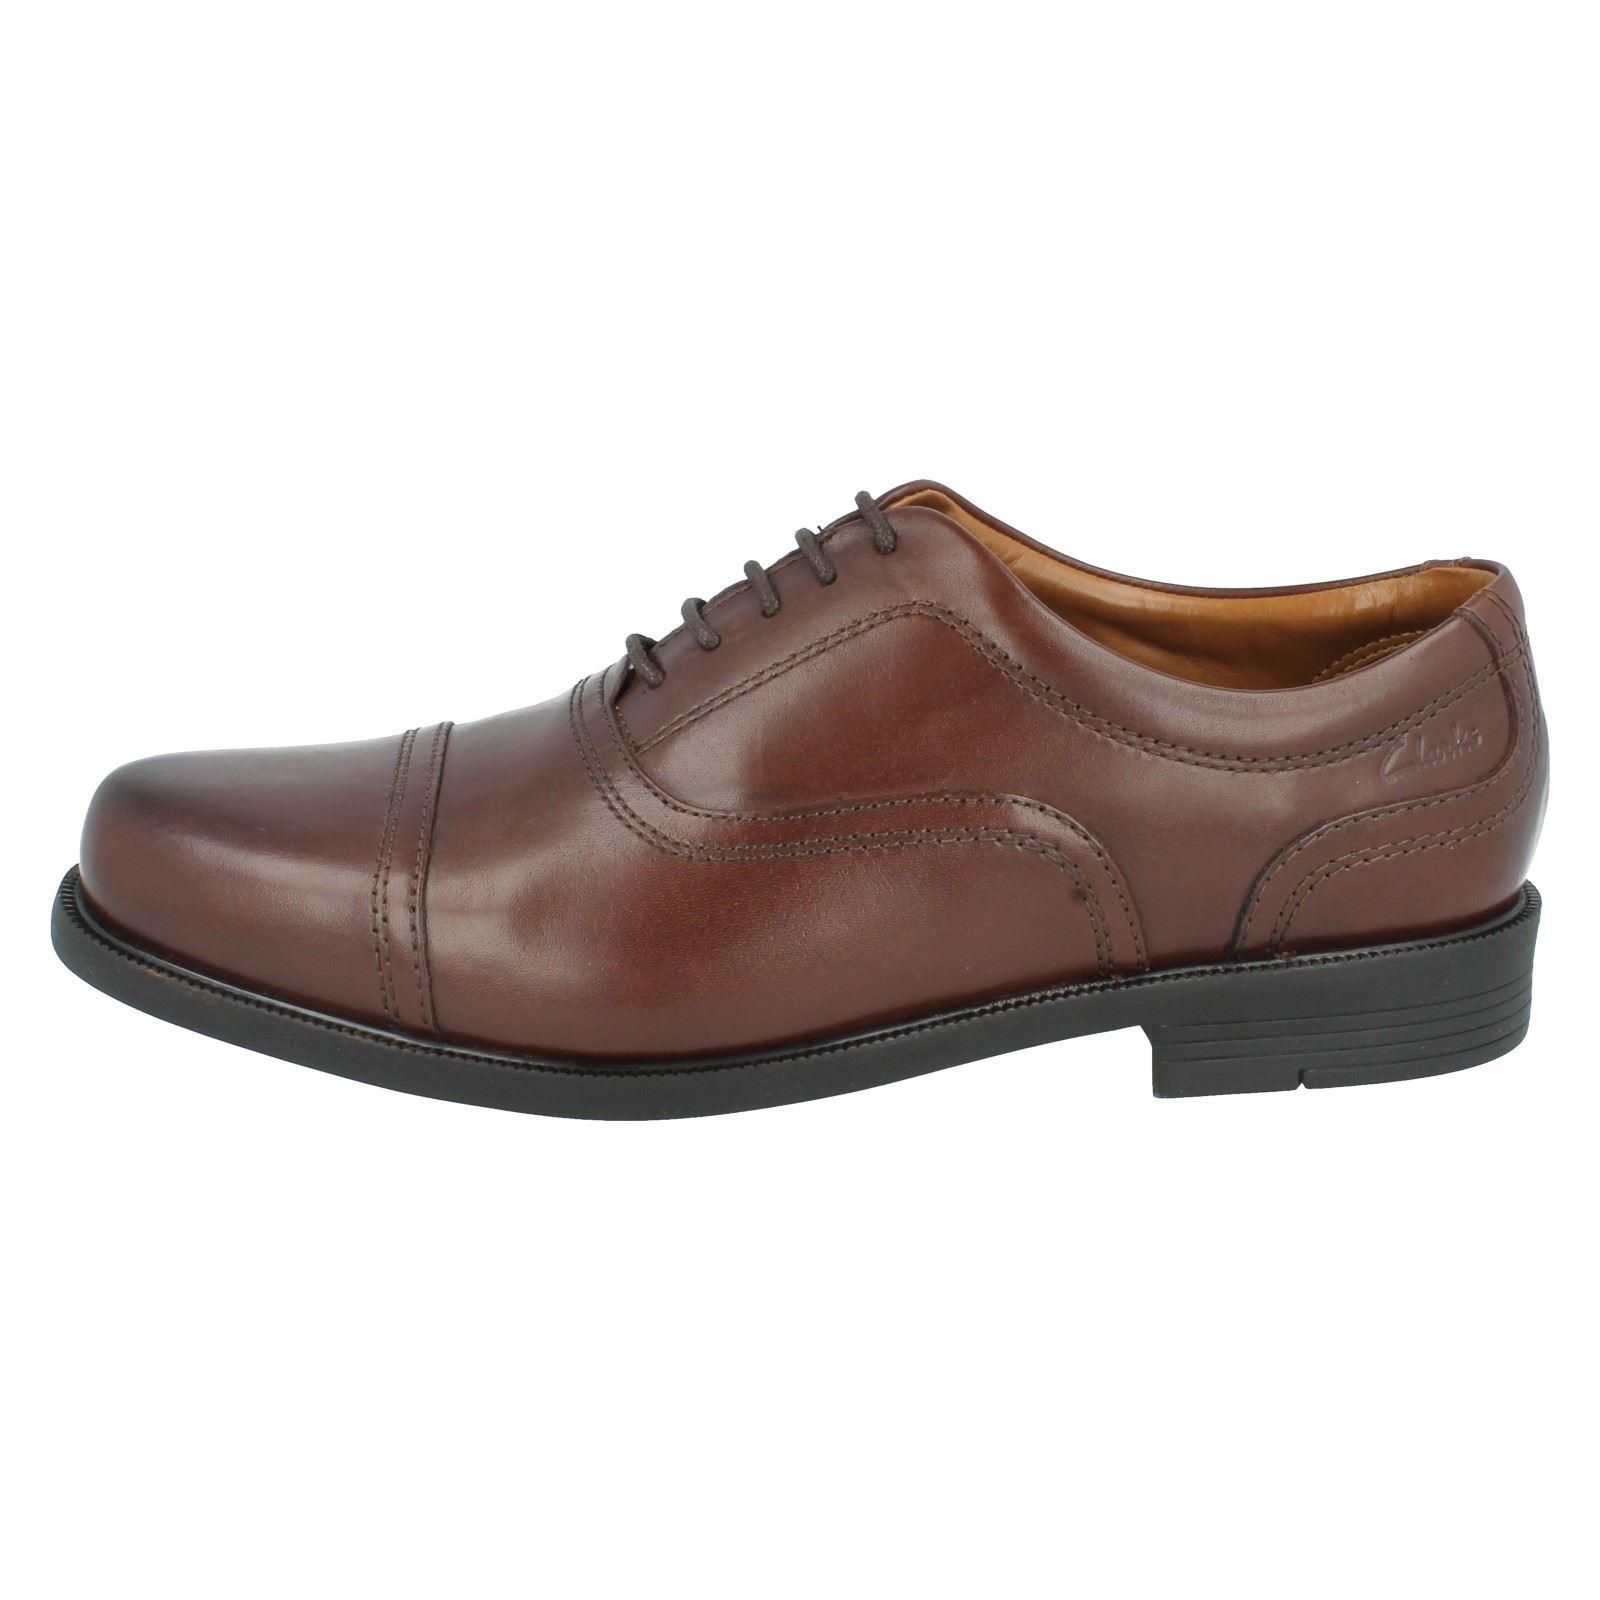 Men's Cap Clarks Schuhes - Beeston Cap Men's 264831